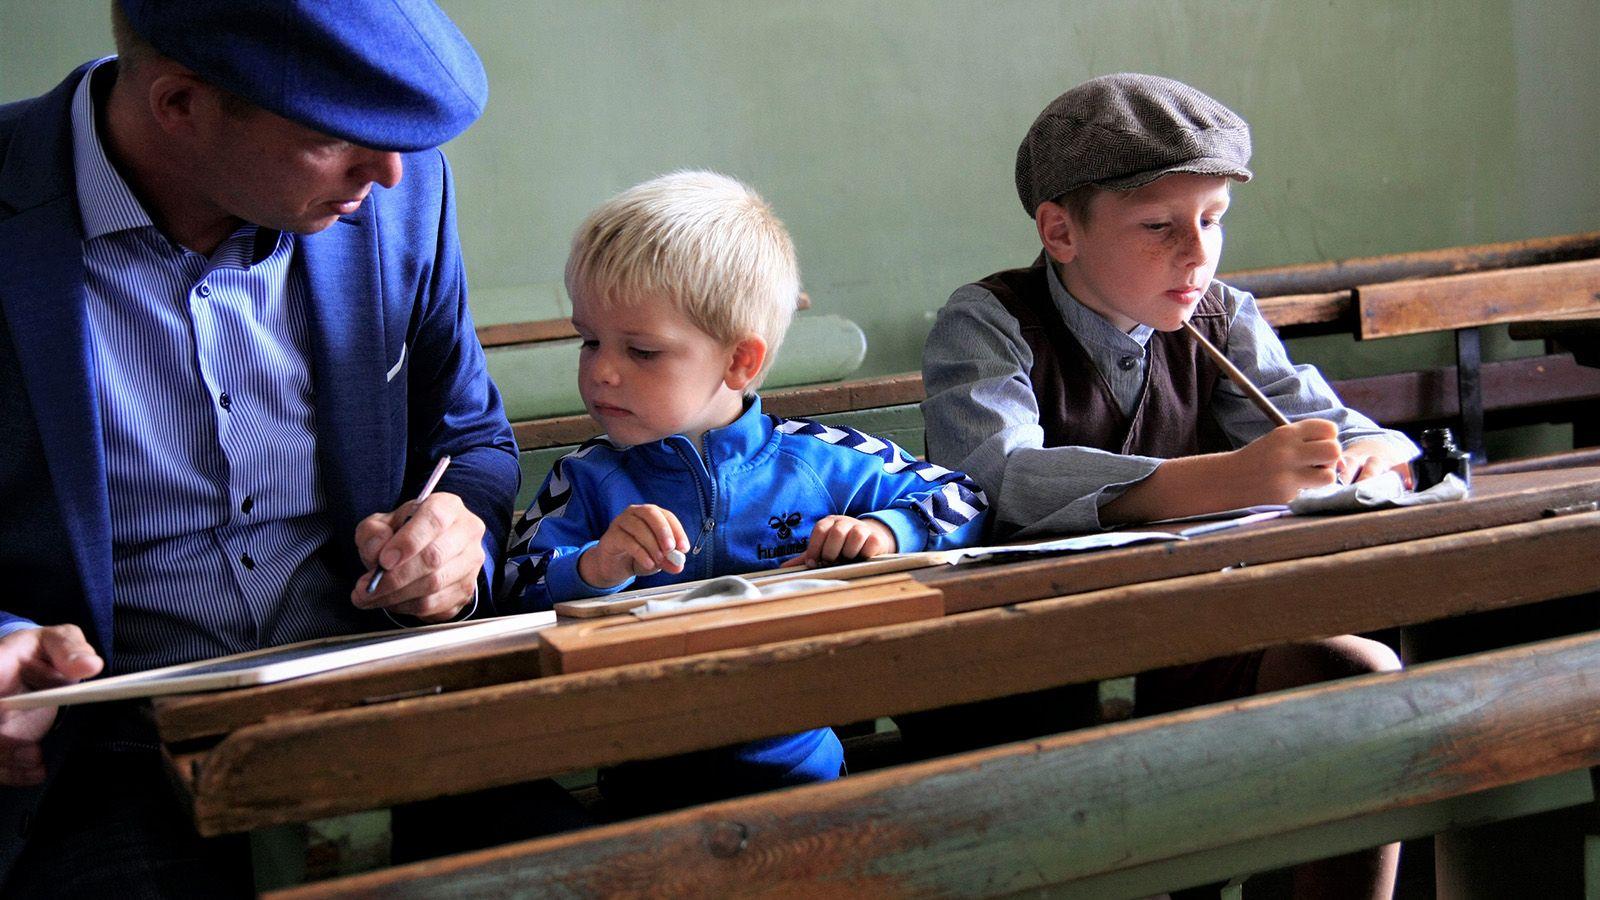 Familieaktivitet – Skole som i gamle dage